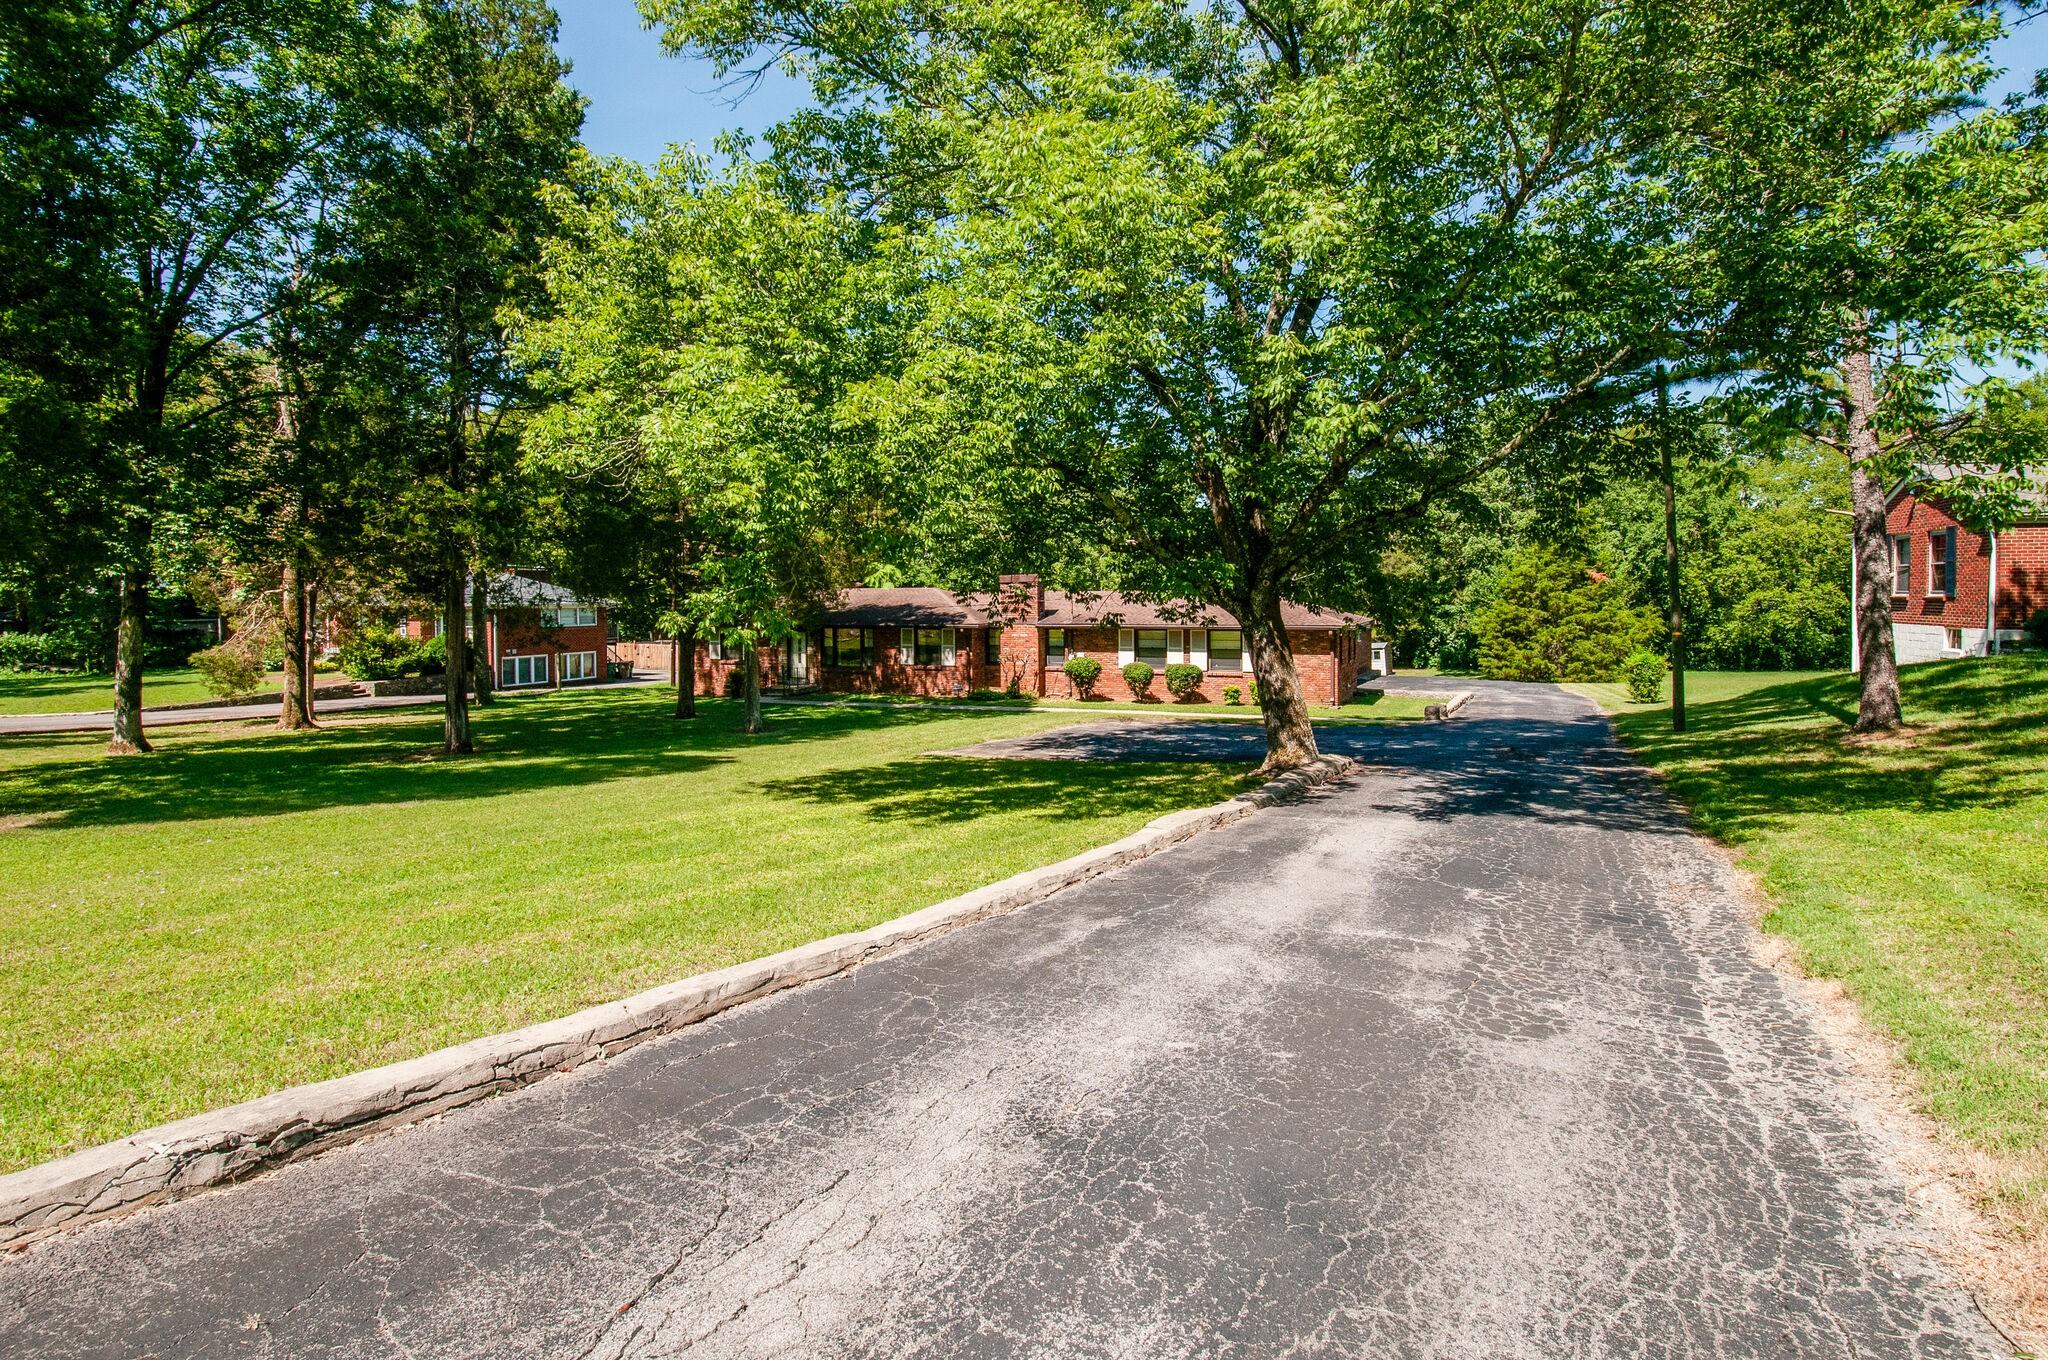 713 N Graycroft Ave Property Photo - Madison, TN real estate listing